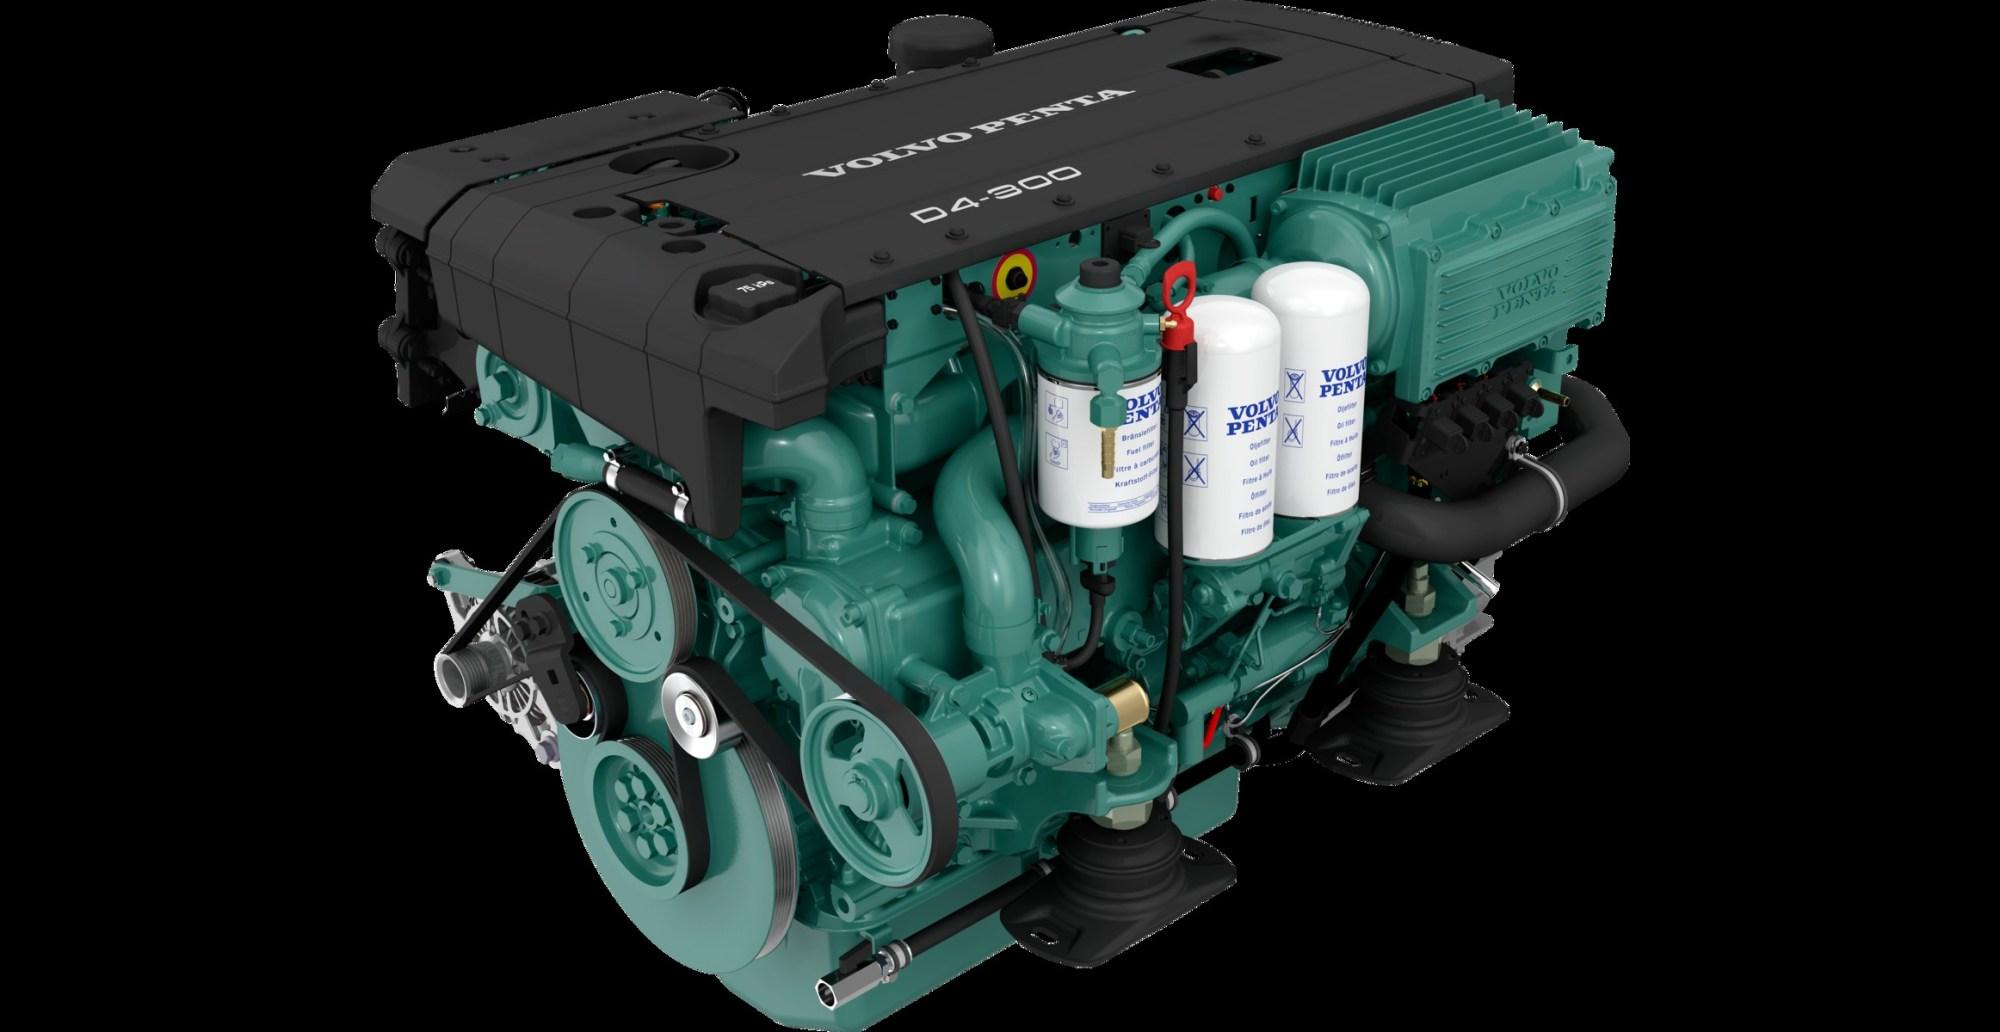 hight resolution of volvo penta marine wiring wiring libraryvolvo penta marine engine diagram d4 300 of volvo penta marine